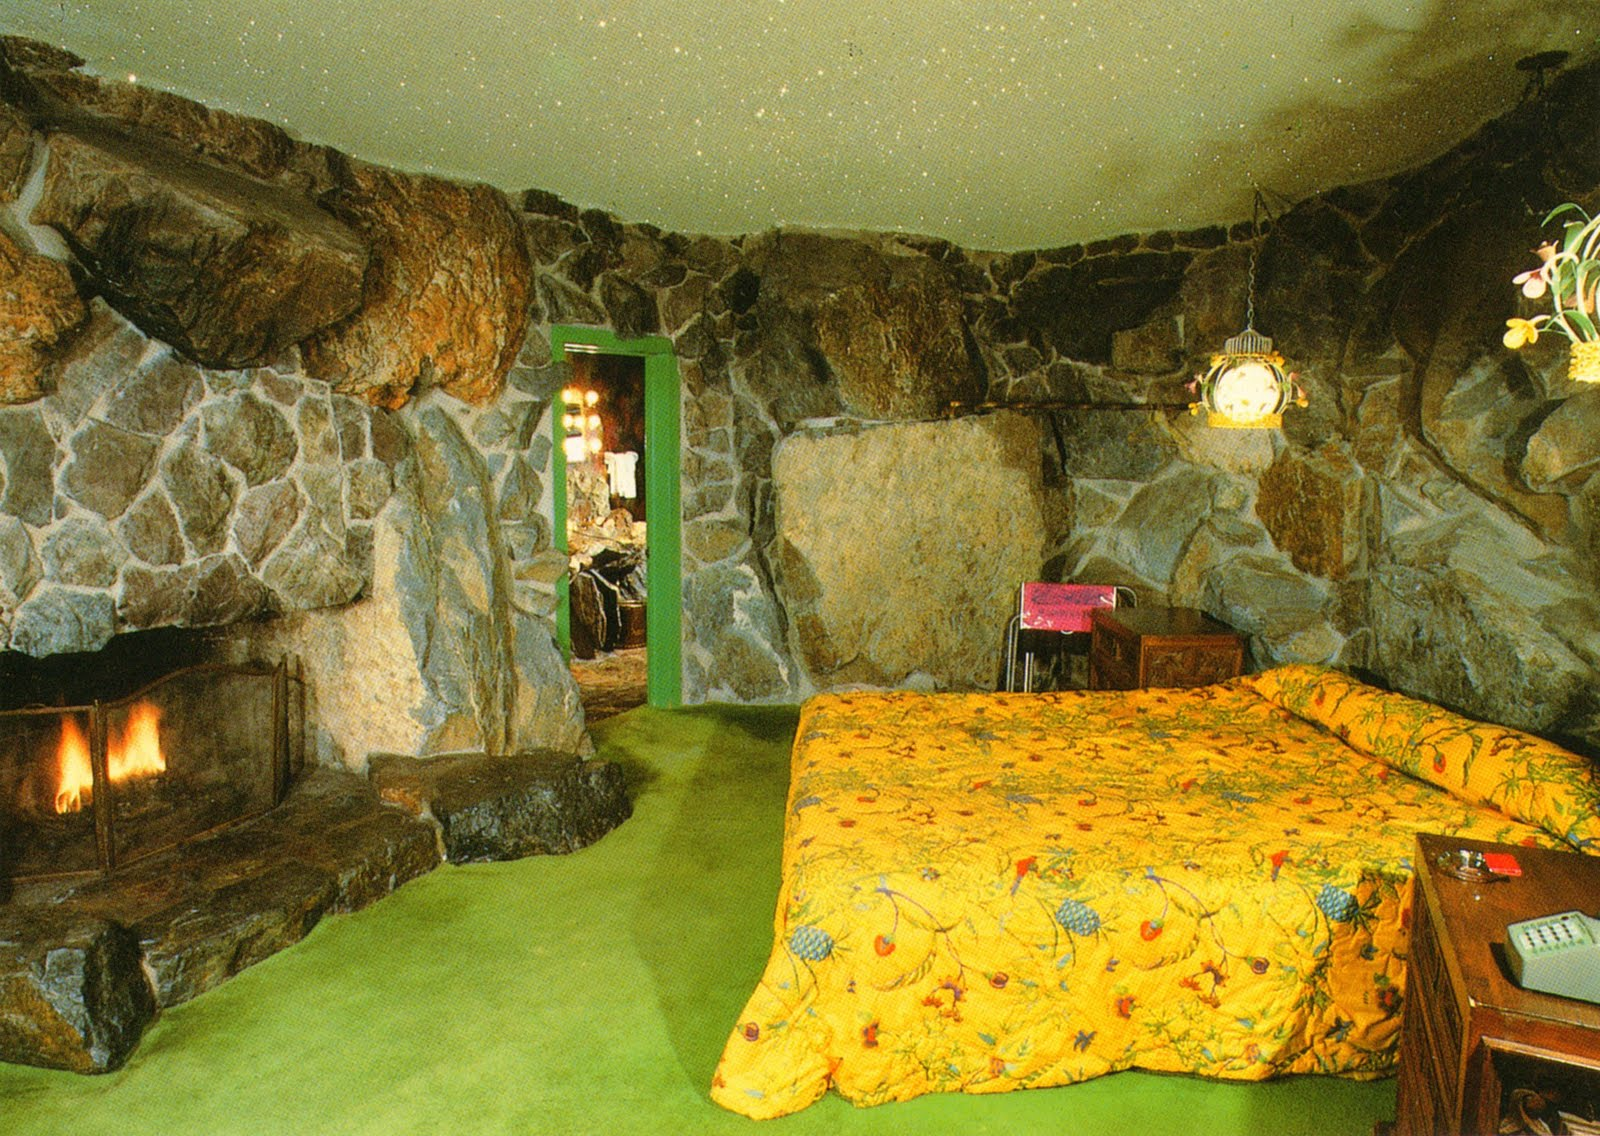 Hotels In San Luis Obispo Ca